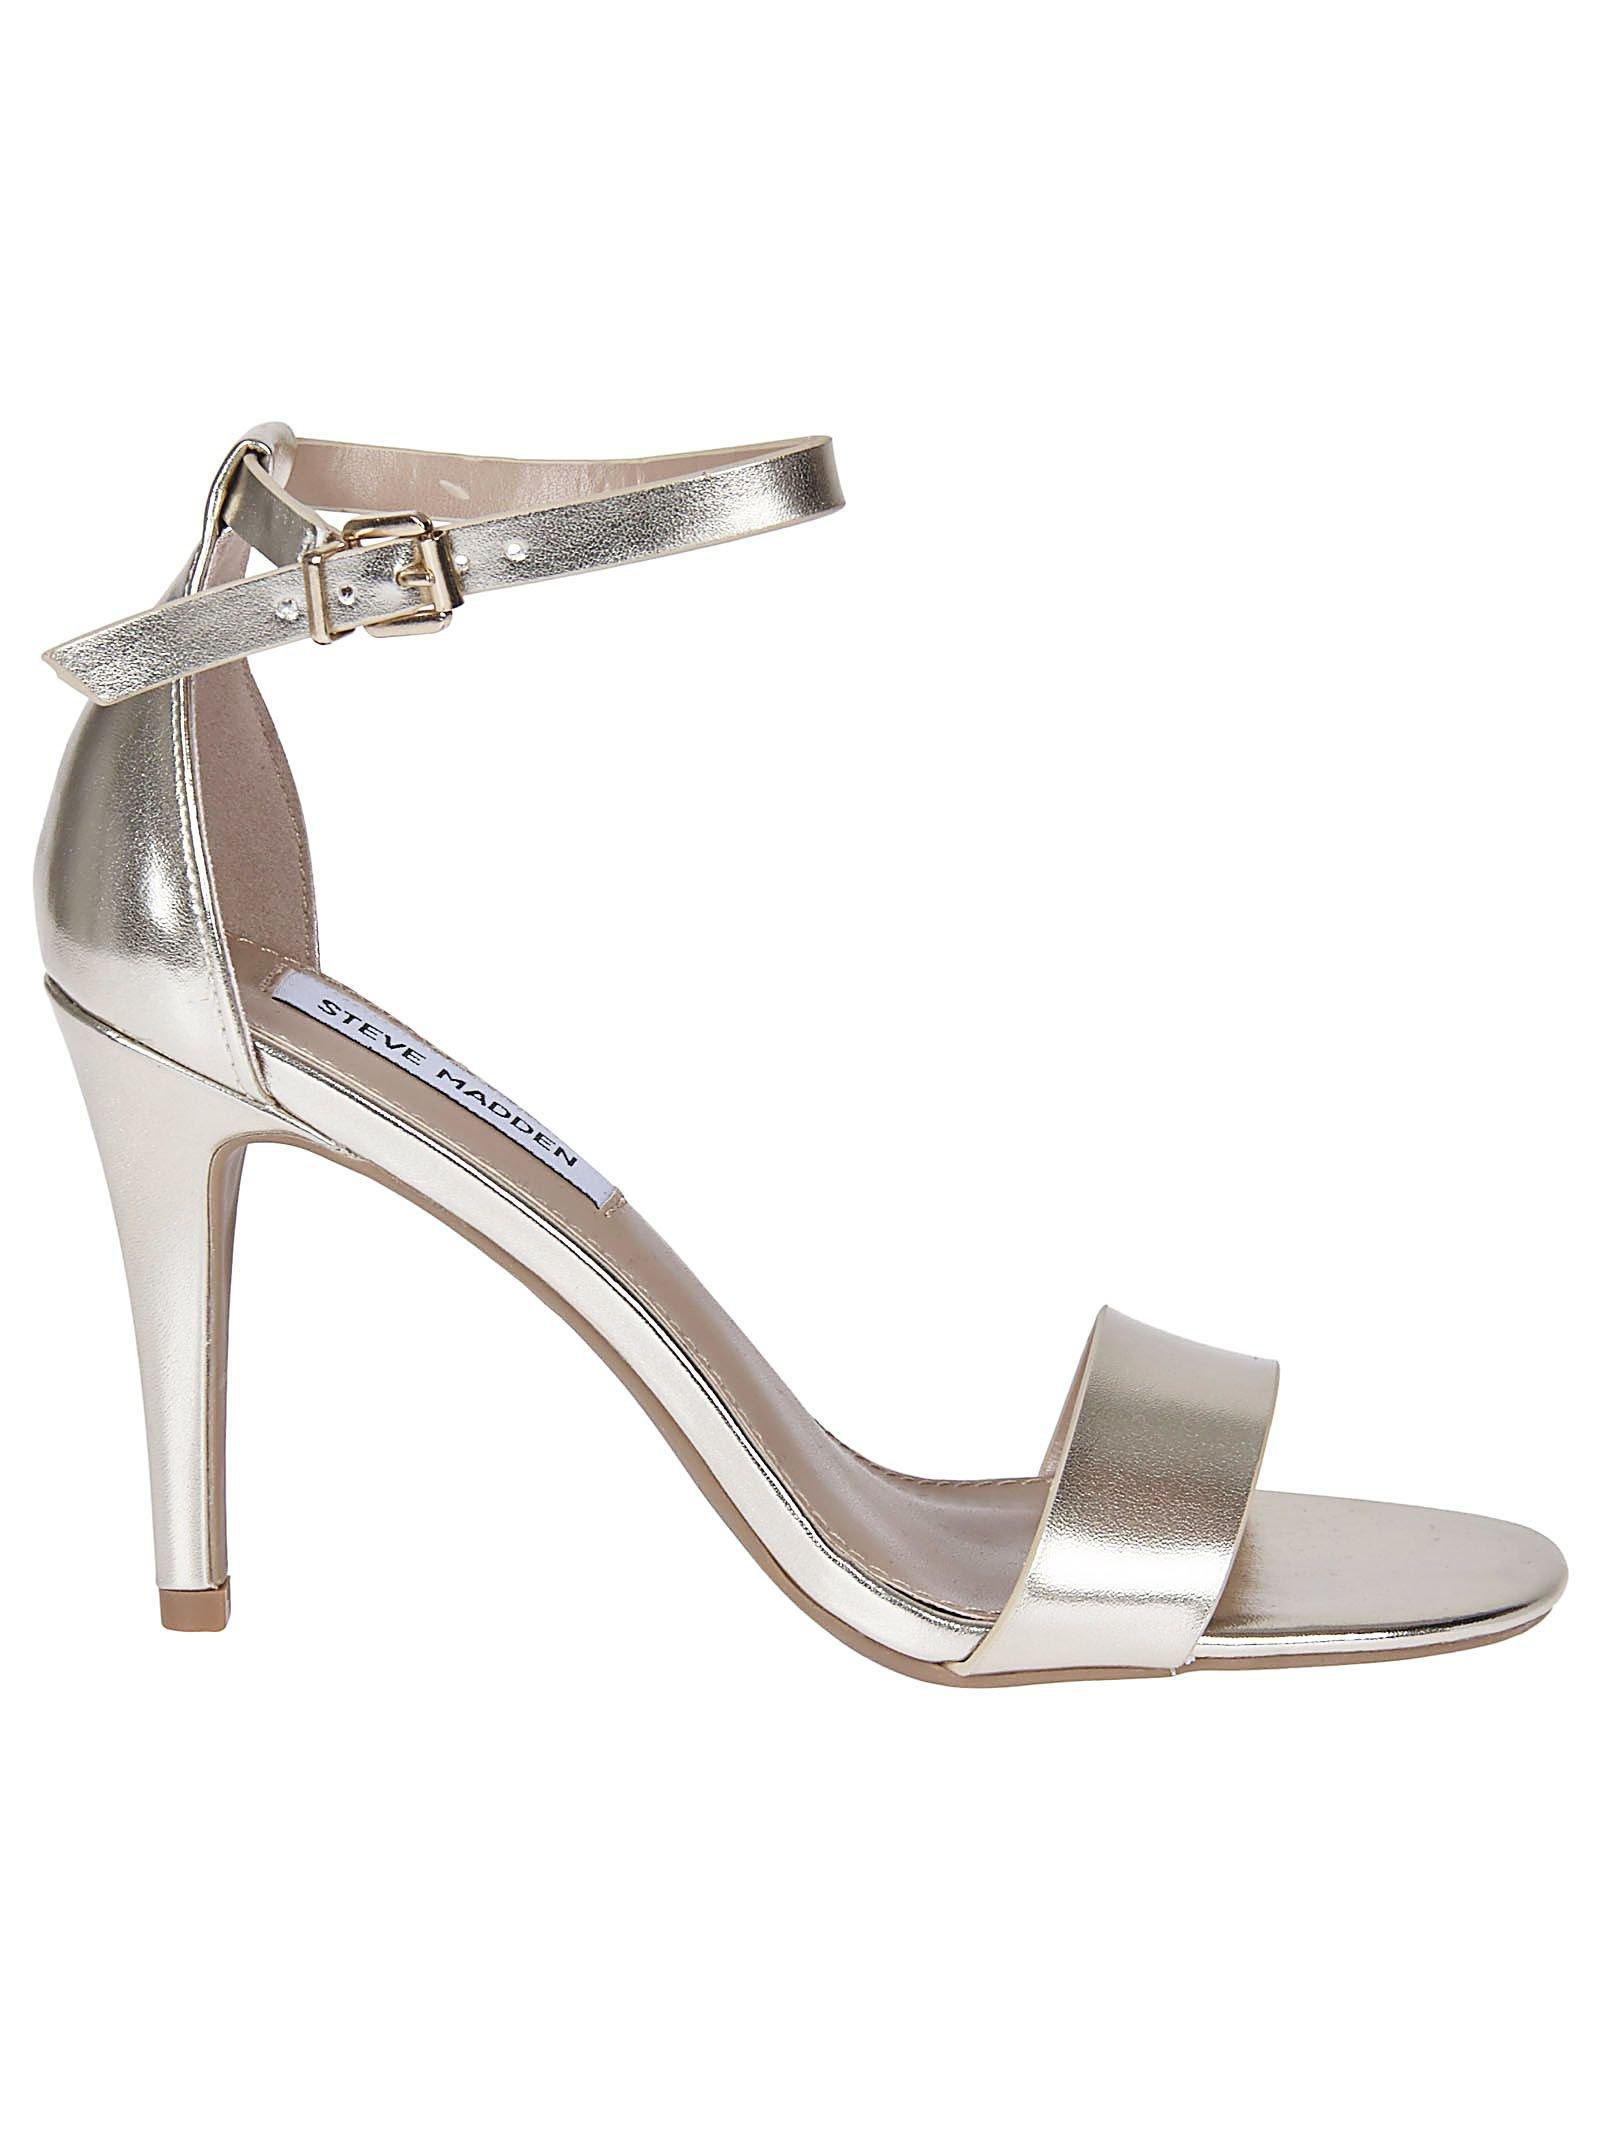 Steve Madden Classic Sandals